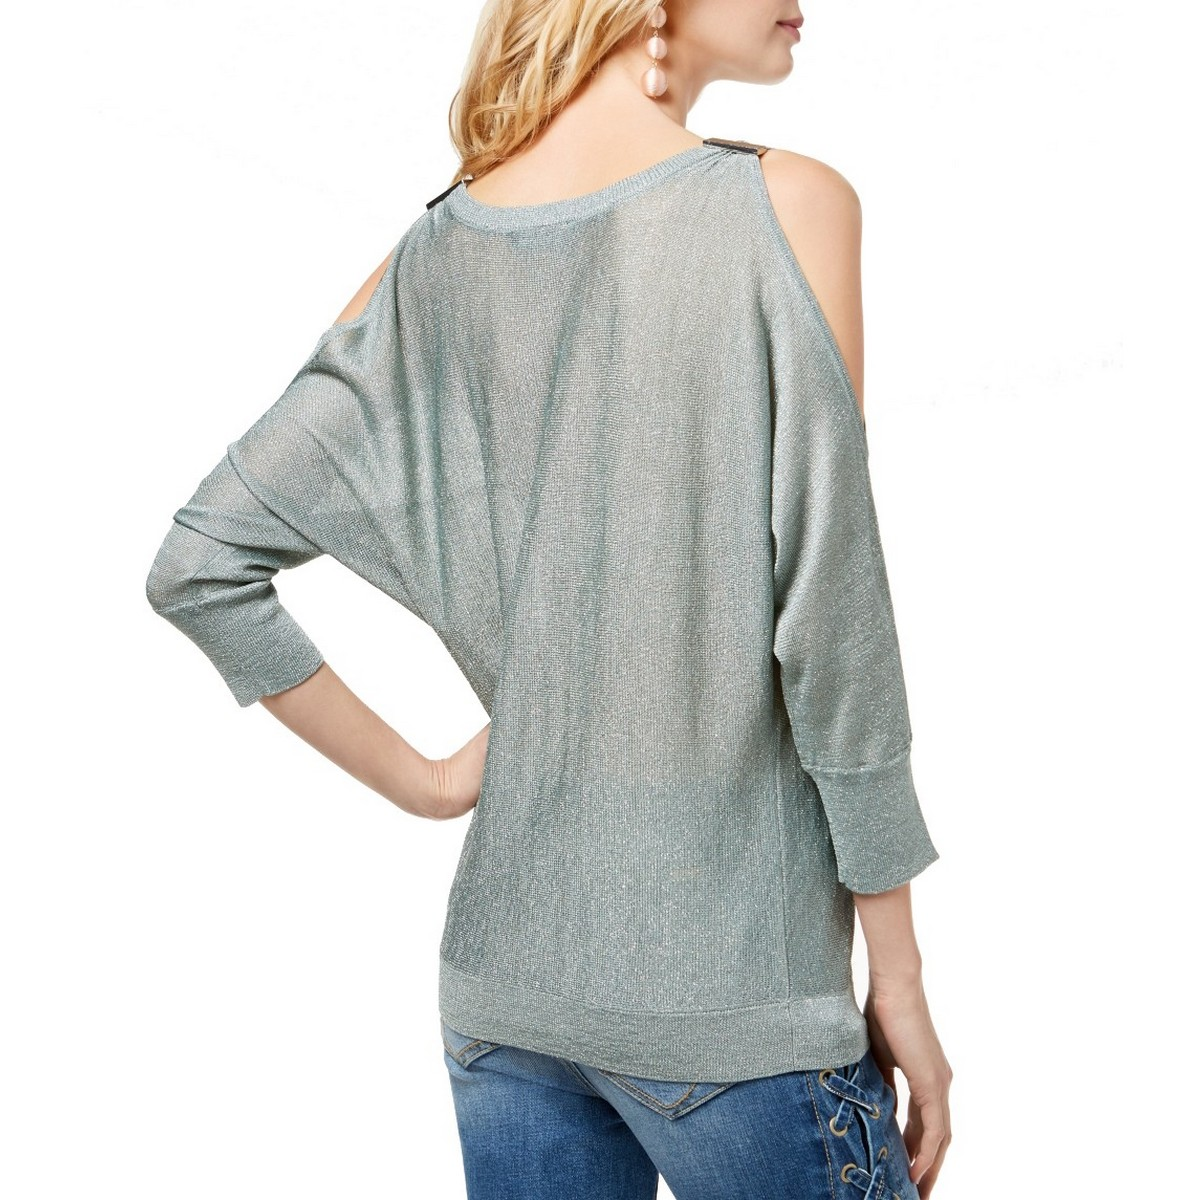 INC-NEW-Women-039-s-Metallic-Cold-Shoulder-Scoop-Neck-Knit-Shirt-Top-TEDO thumbnail 3